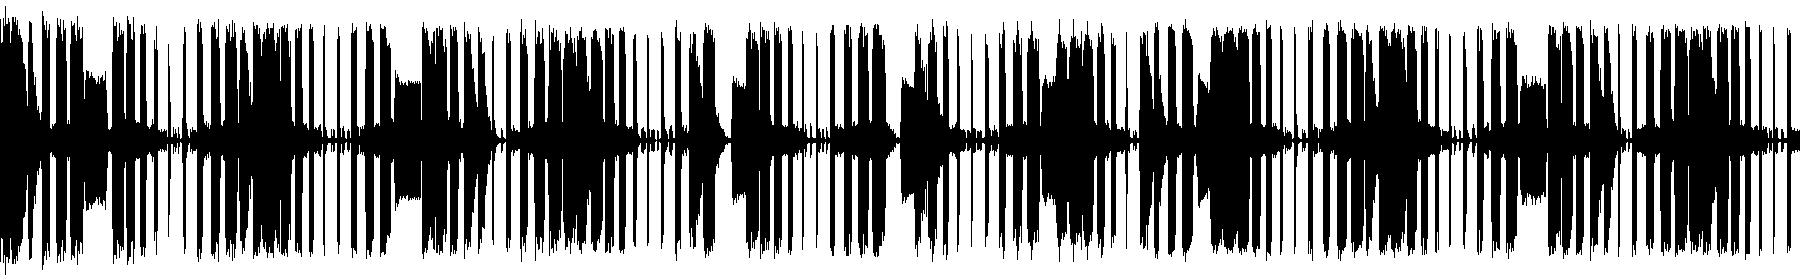 dts chordlp 15 cm